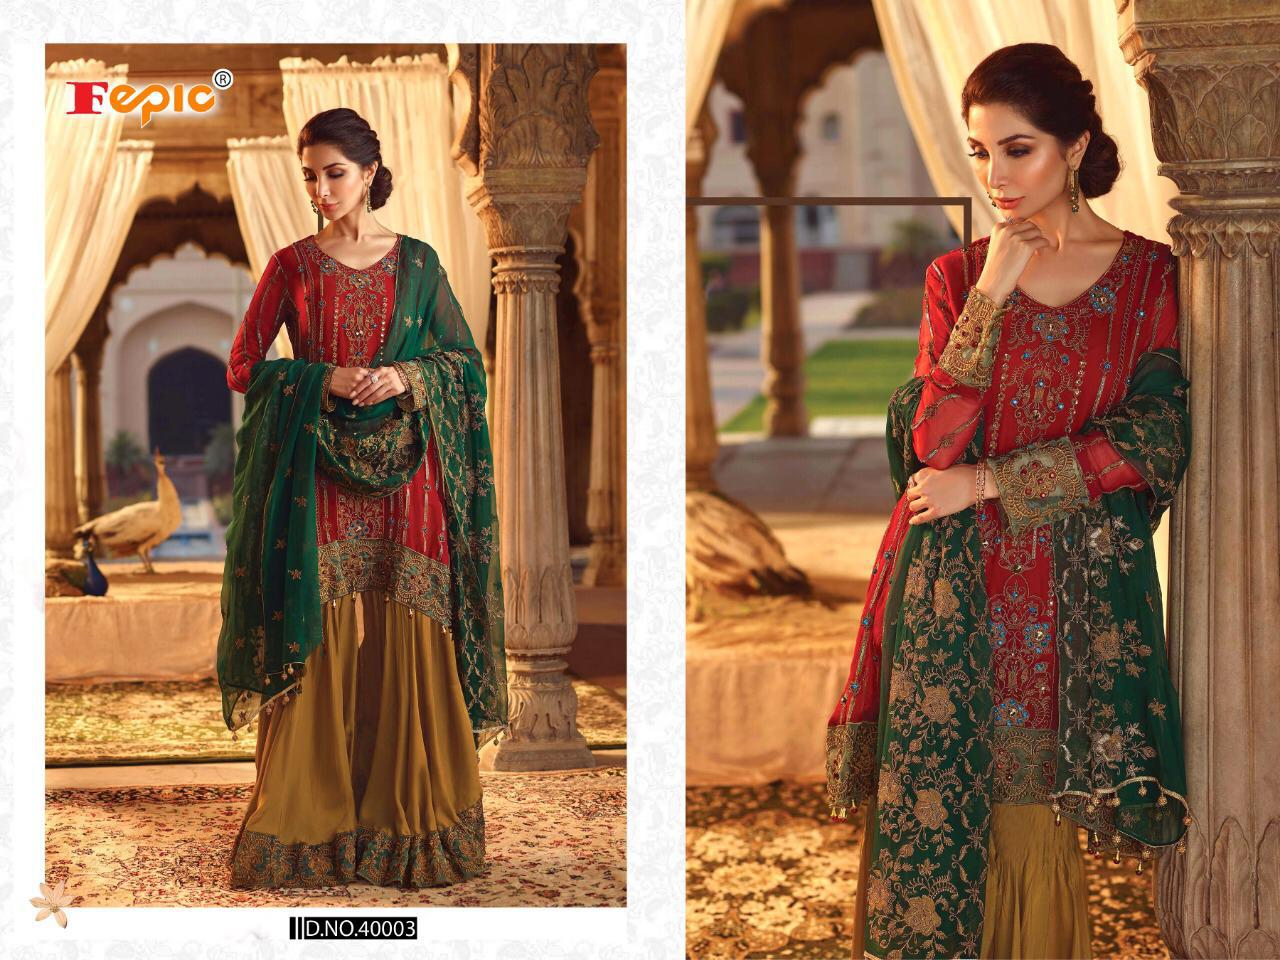 Rosmeen Royal Luxury Pakistani New Desinger Suits Wholsale